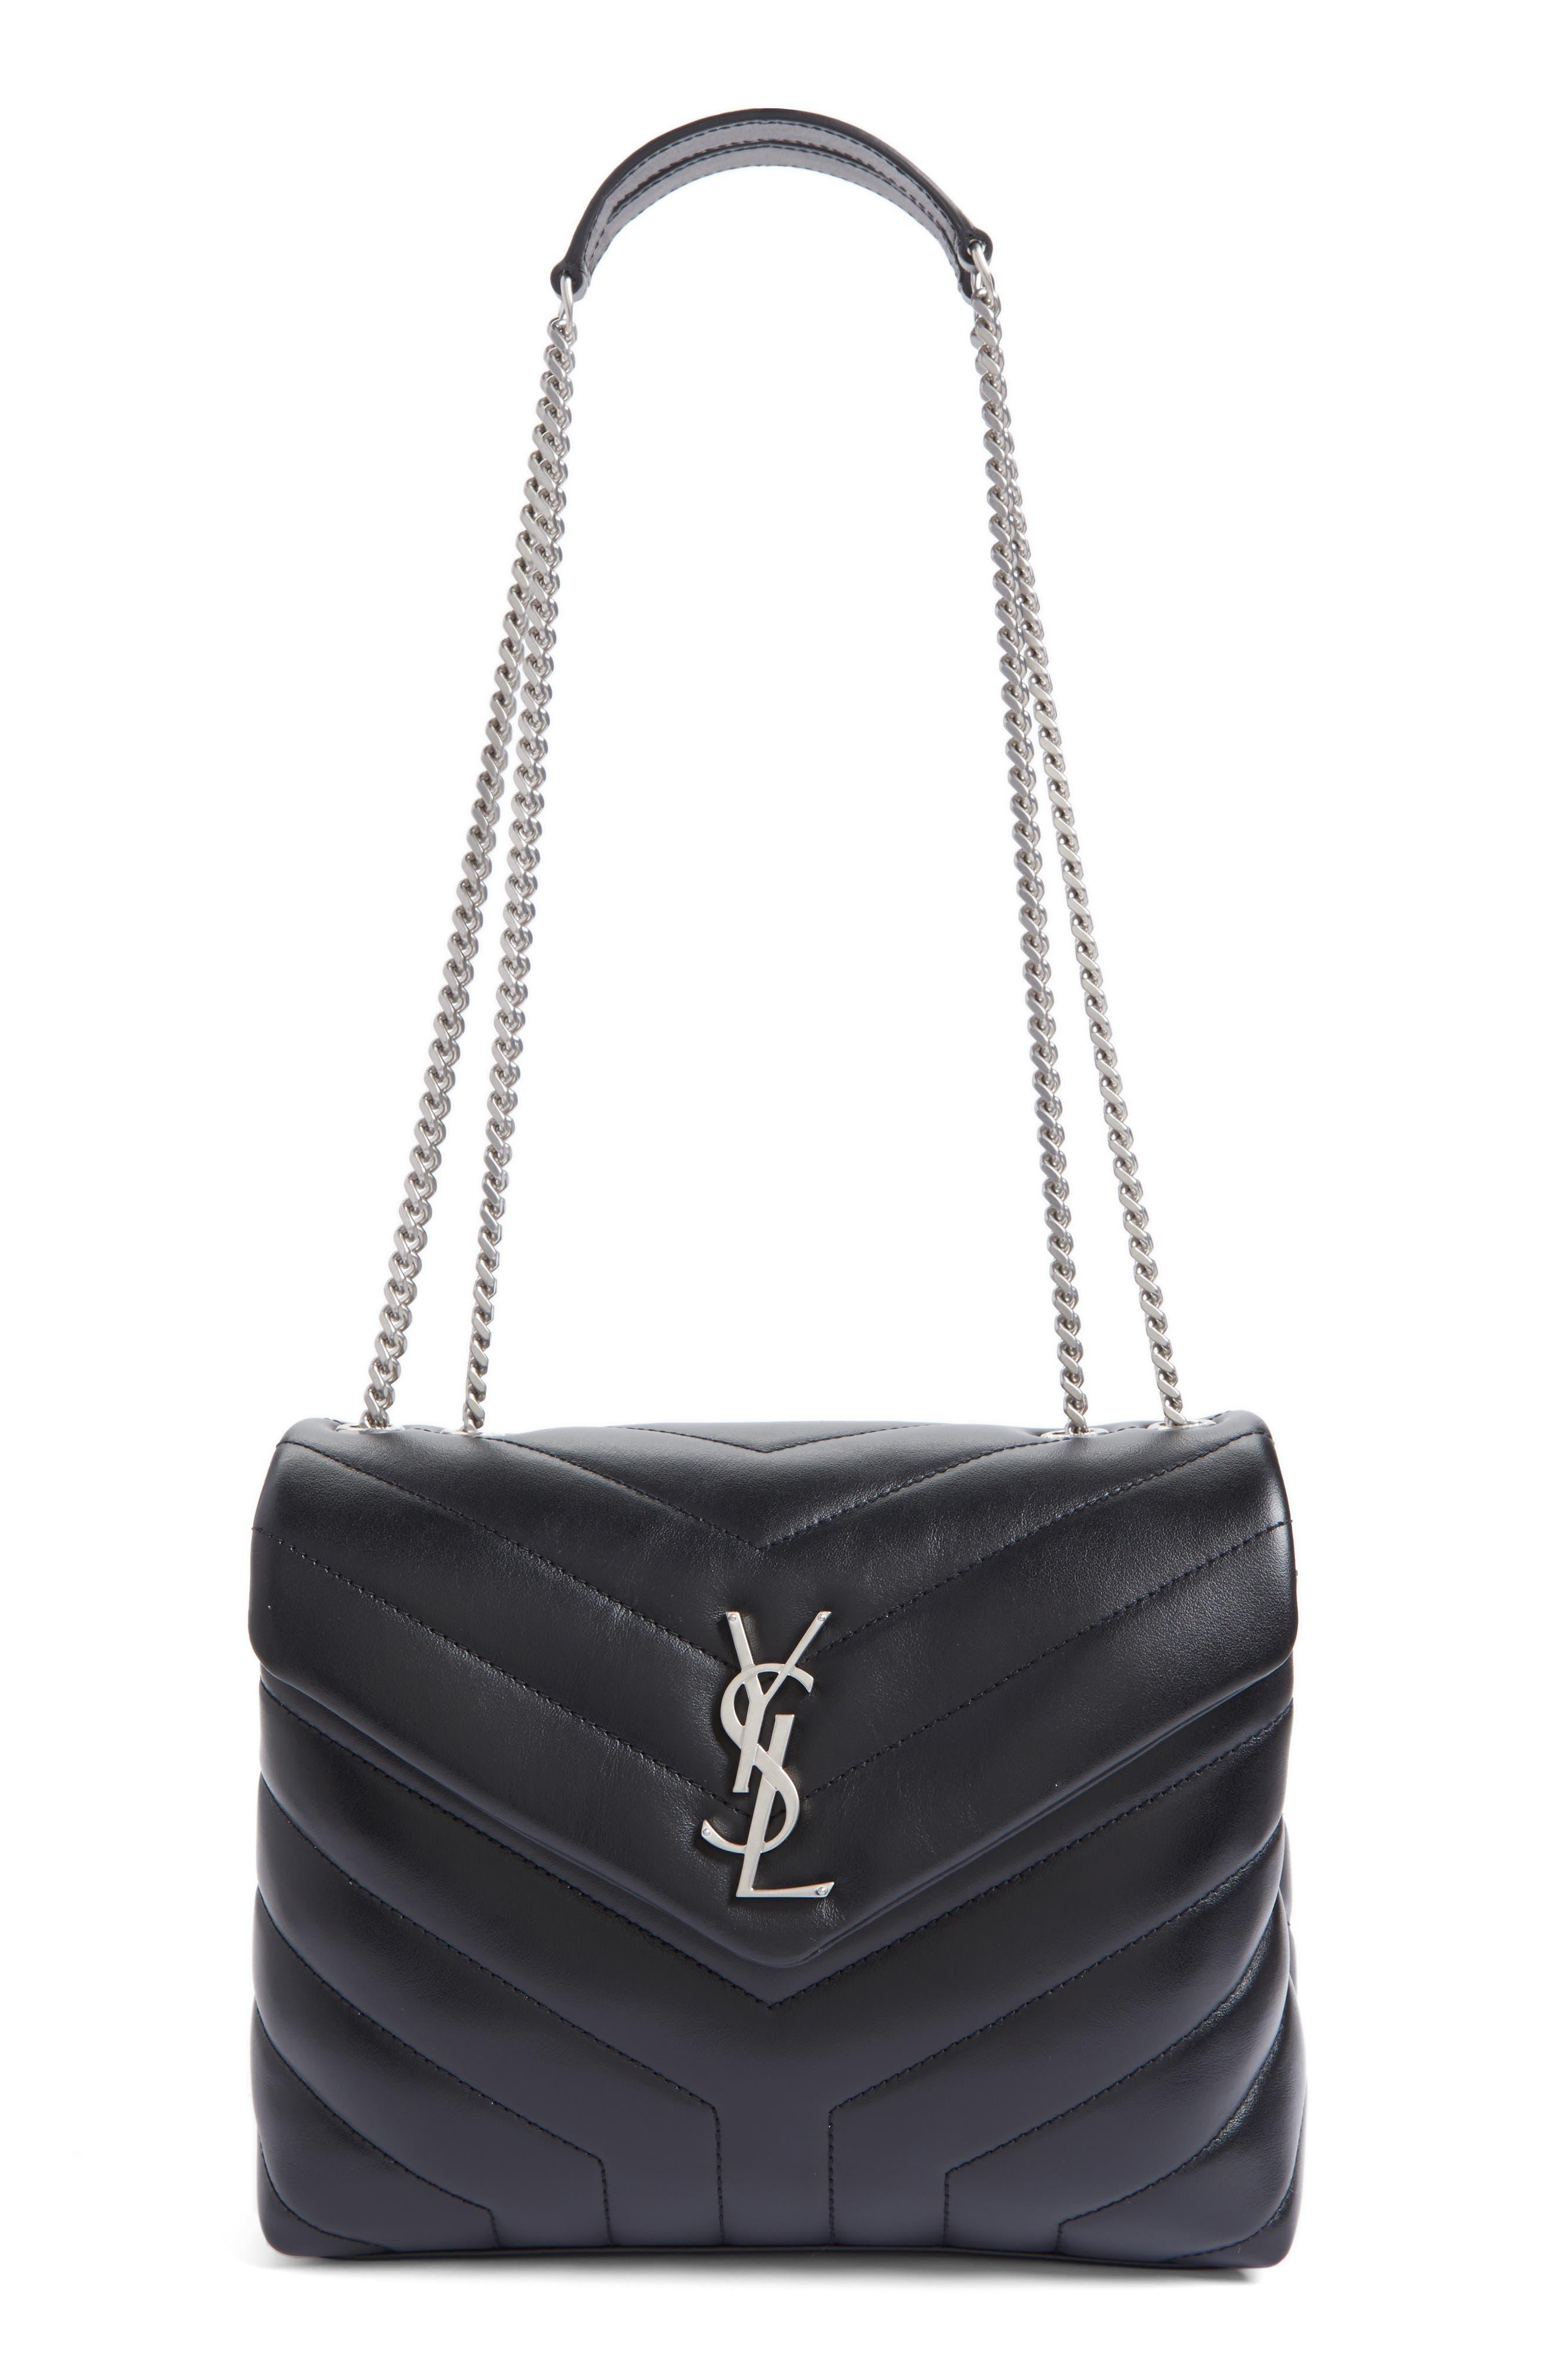 Loulou Monogram Ysl Small V-Flap Chain Shoulder Bag - Miroir Hardware, Black